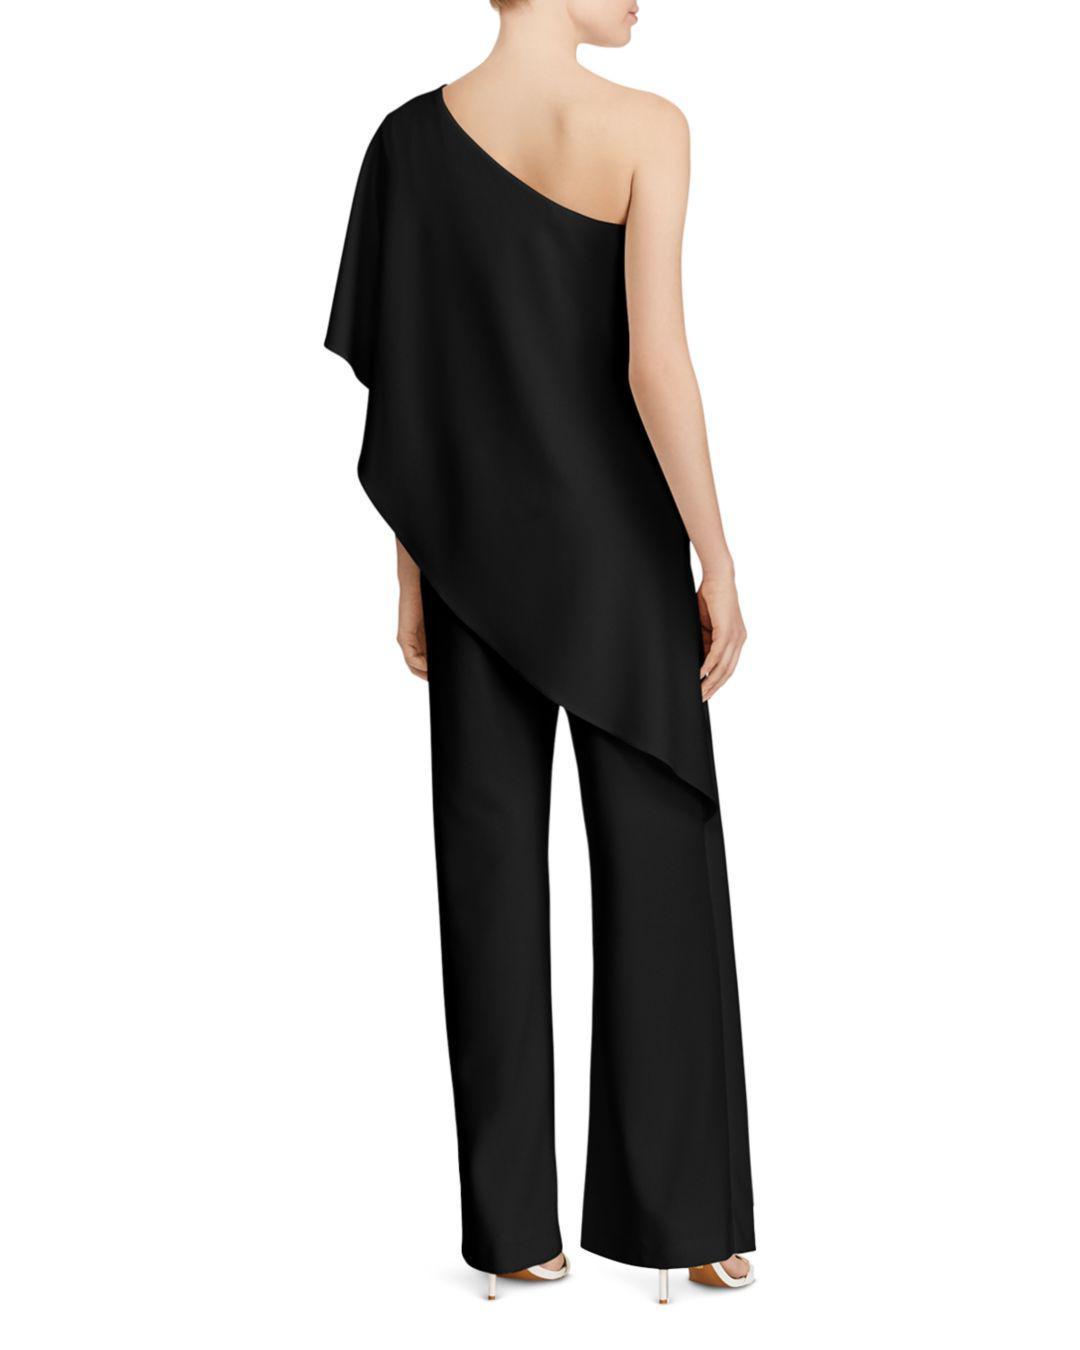 a9f5925a356 Lyst - Ralph Lauren Lauren Ruffle One-shoulder Jumpsuit in Black